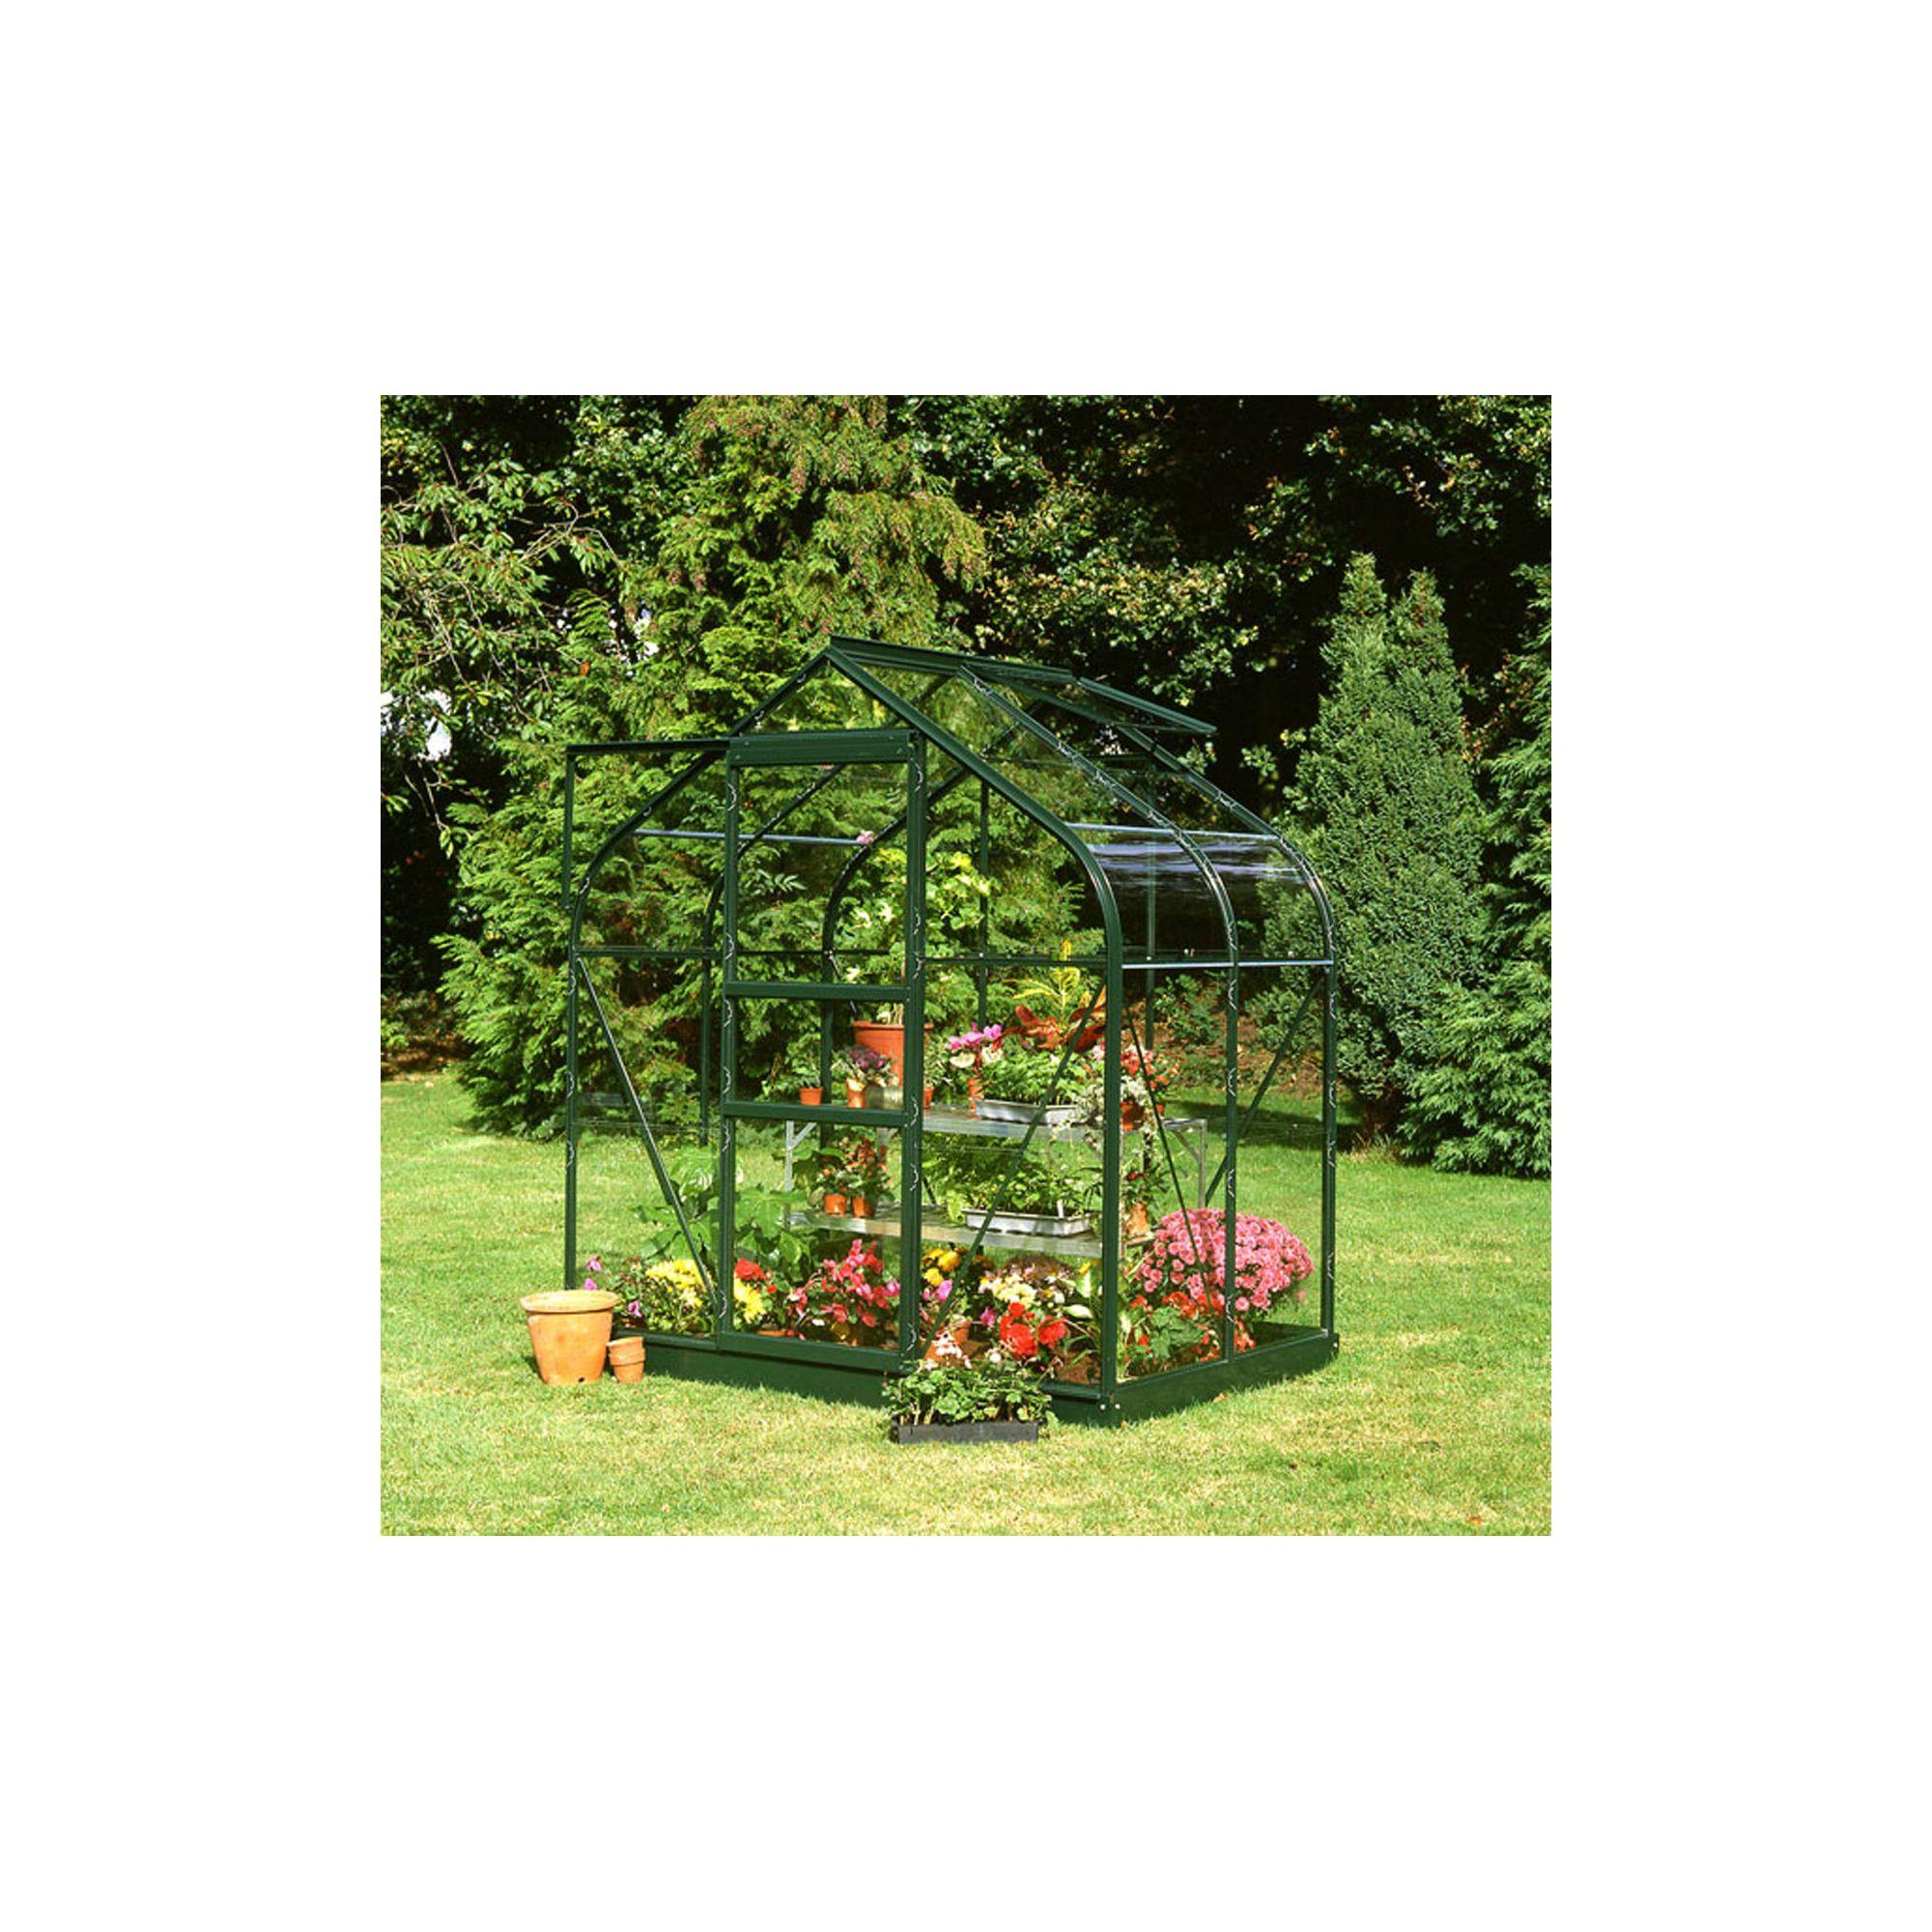 Halls 4x6 Supreme Greenframe Greenhouse + Base - Horticultural Glass at Tescos Direct